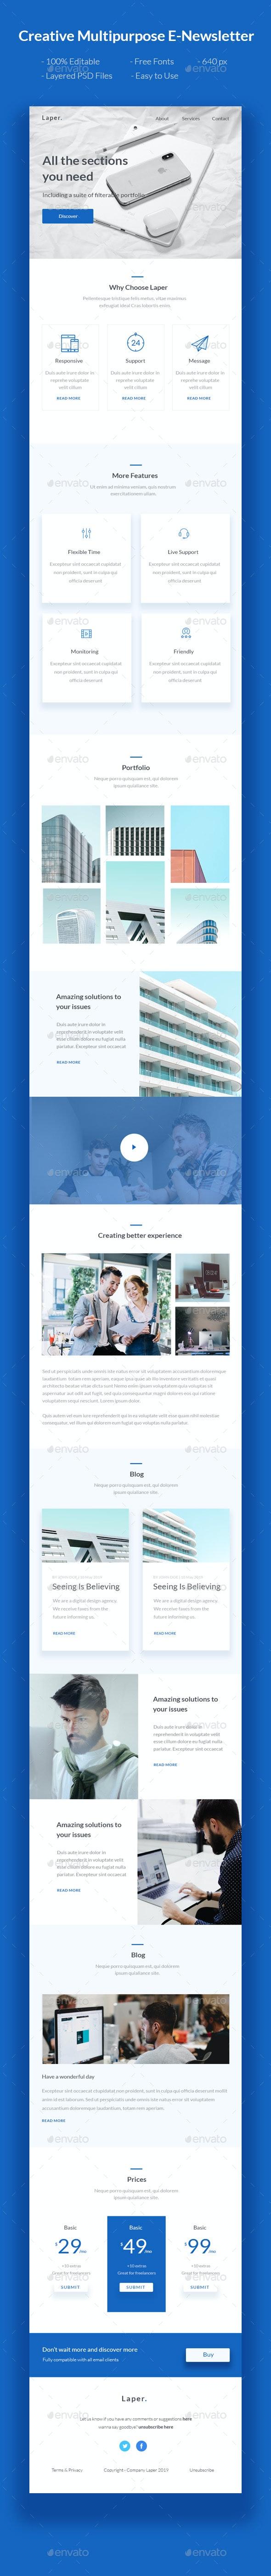 Laper - Creative Multipurpose E-Newsletter - E-newsletters Web Elements